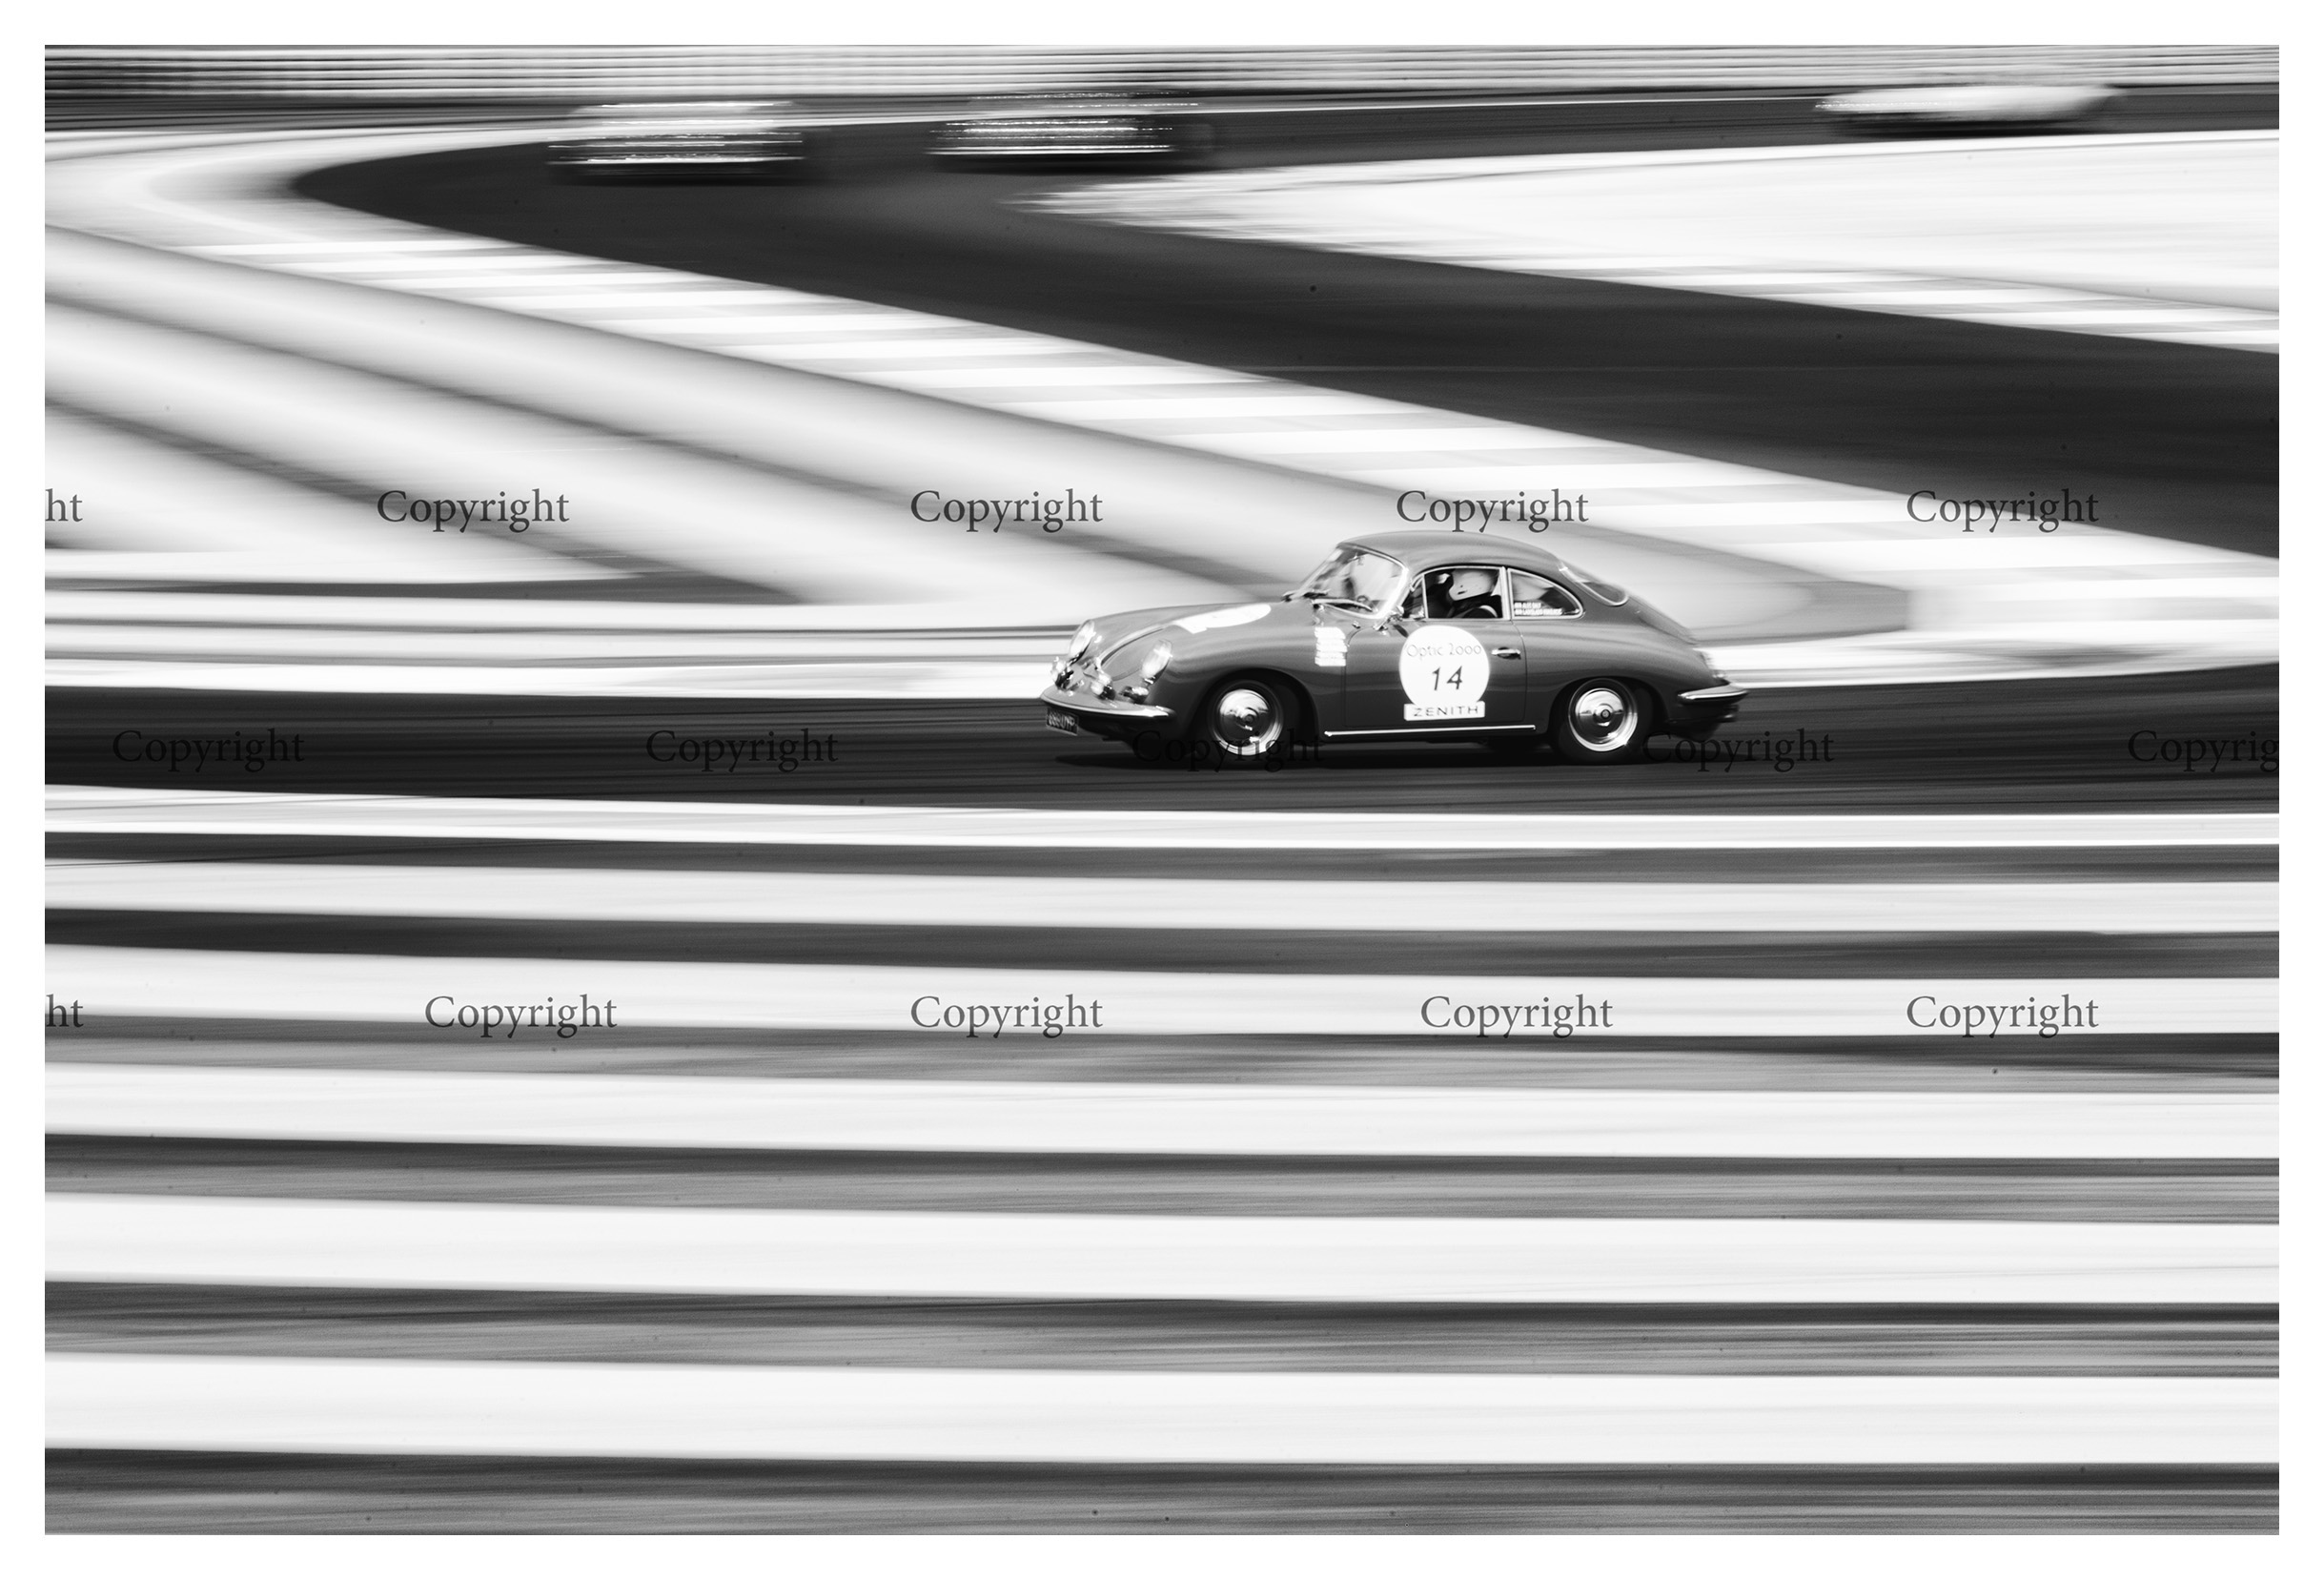 356 2000 GS Carrera 1962 B